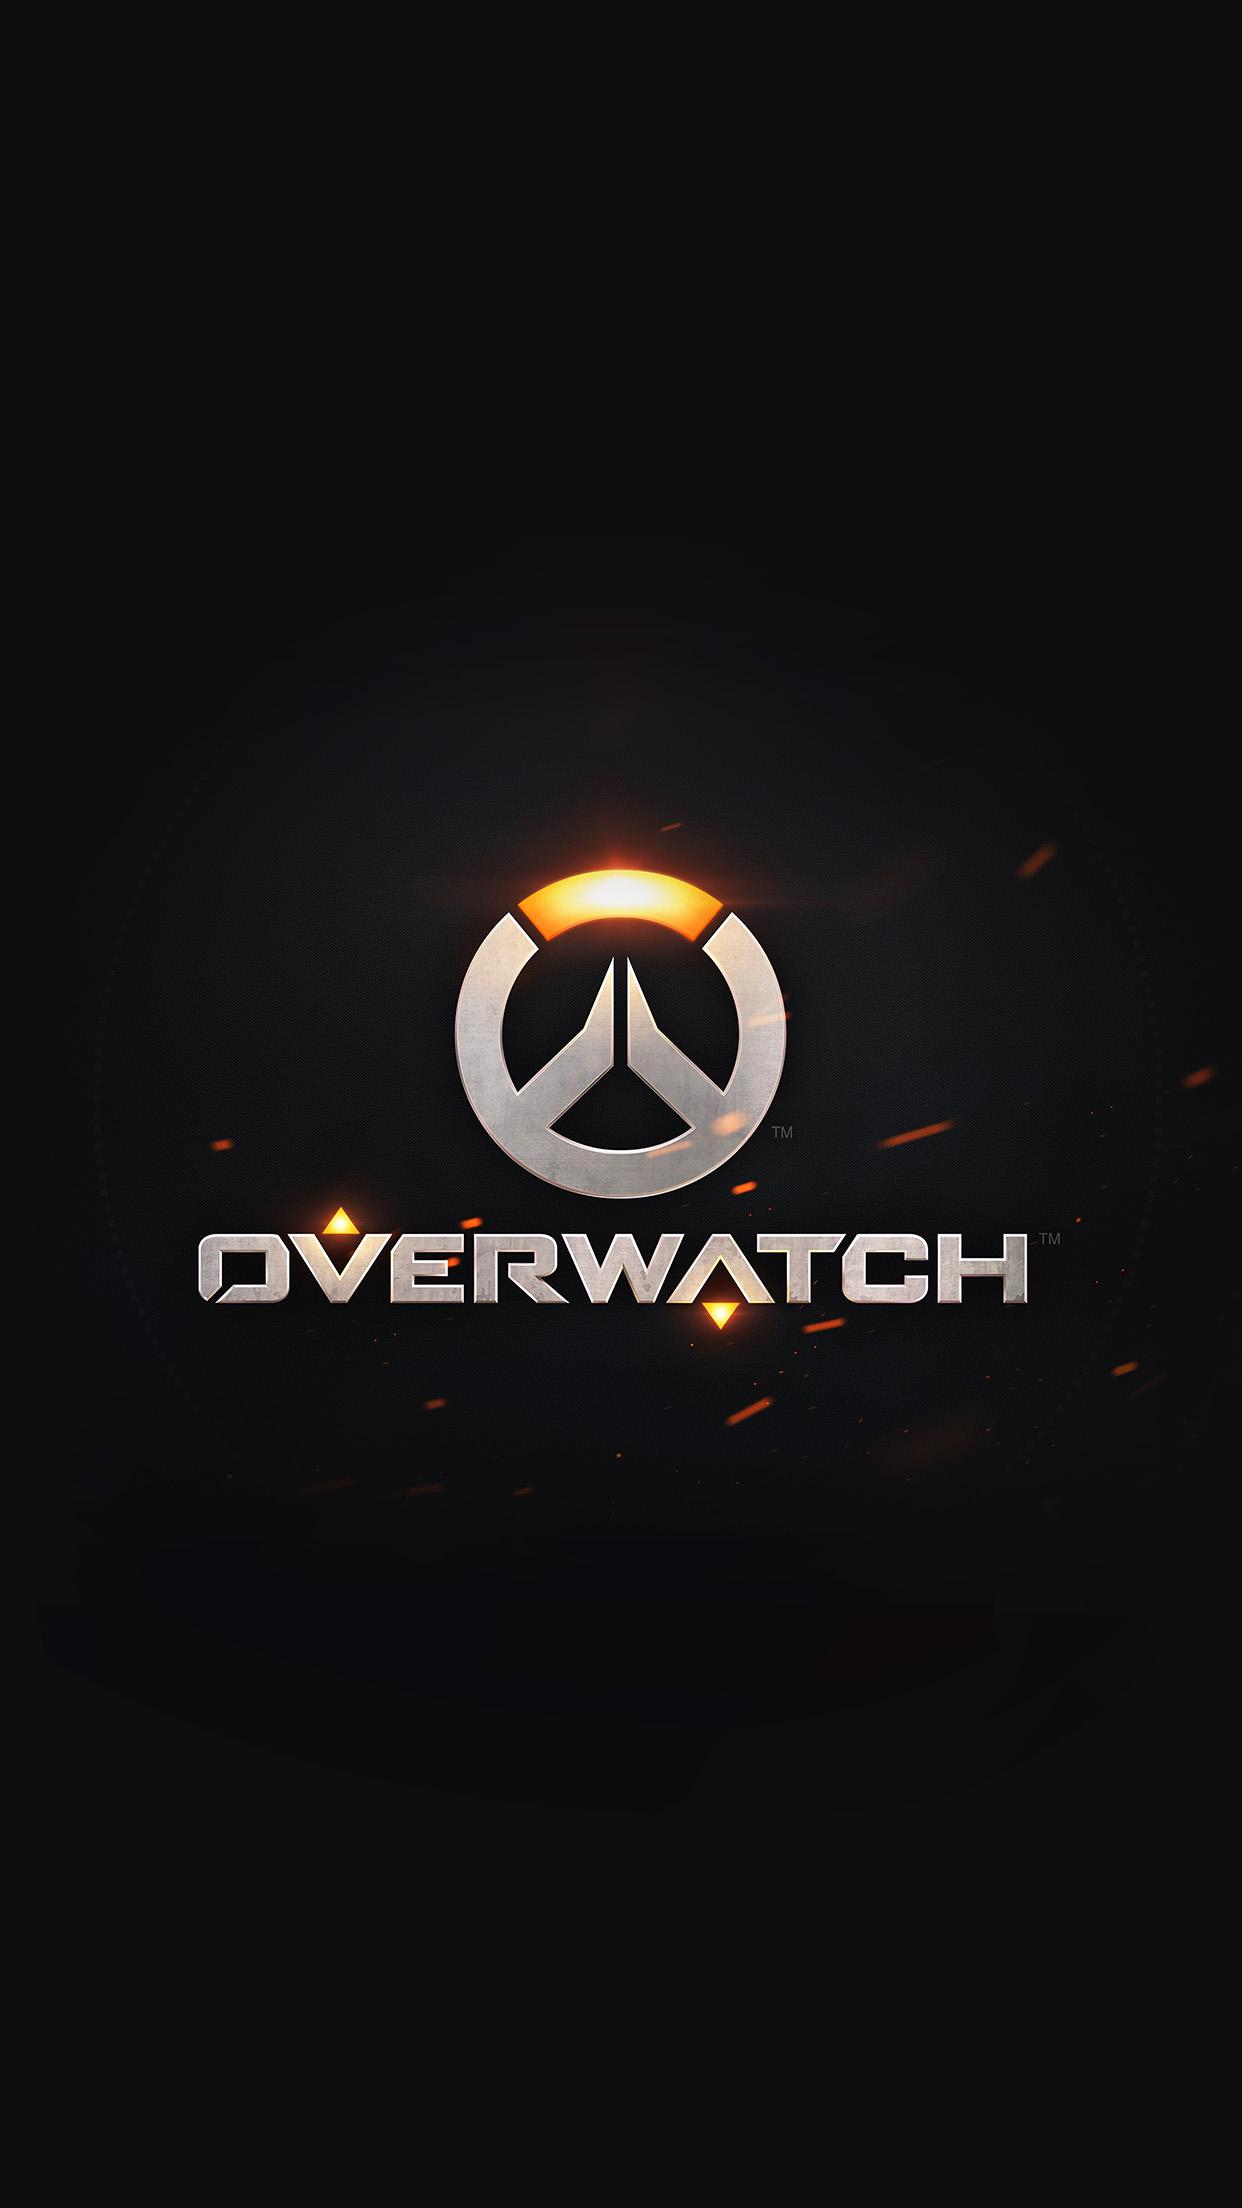 Overwatch Logo 3Wallpapers iPhone Parallax Overwatch: Logo